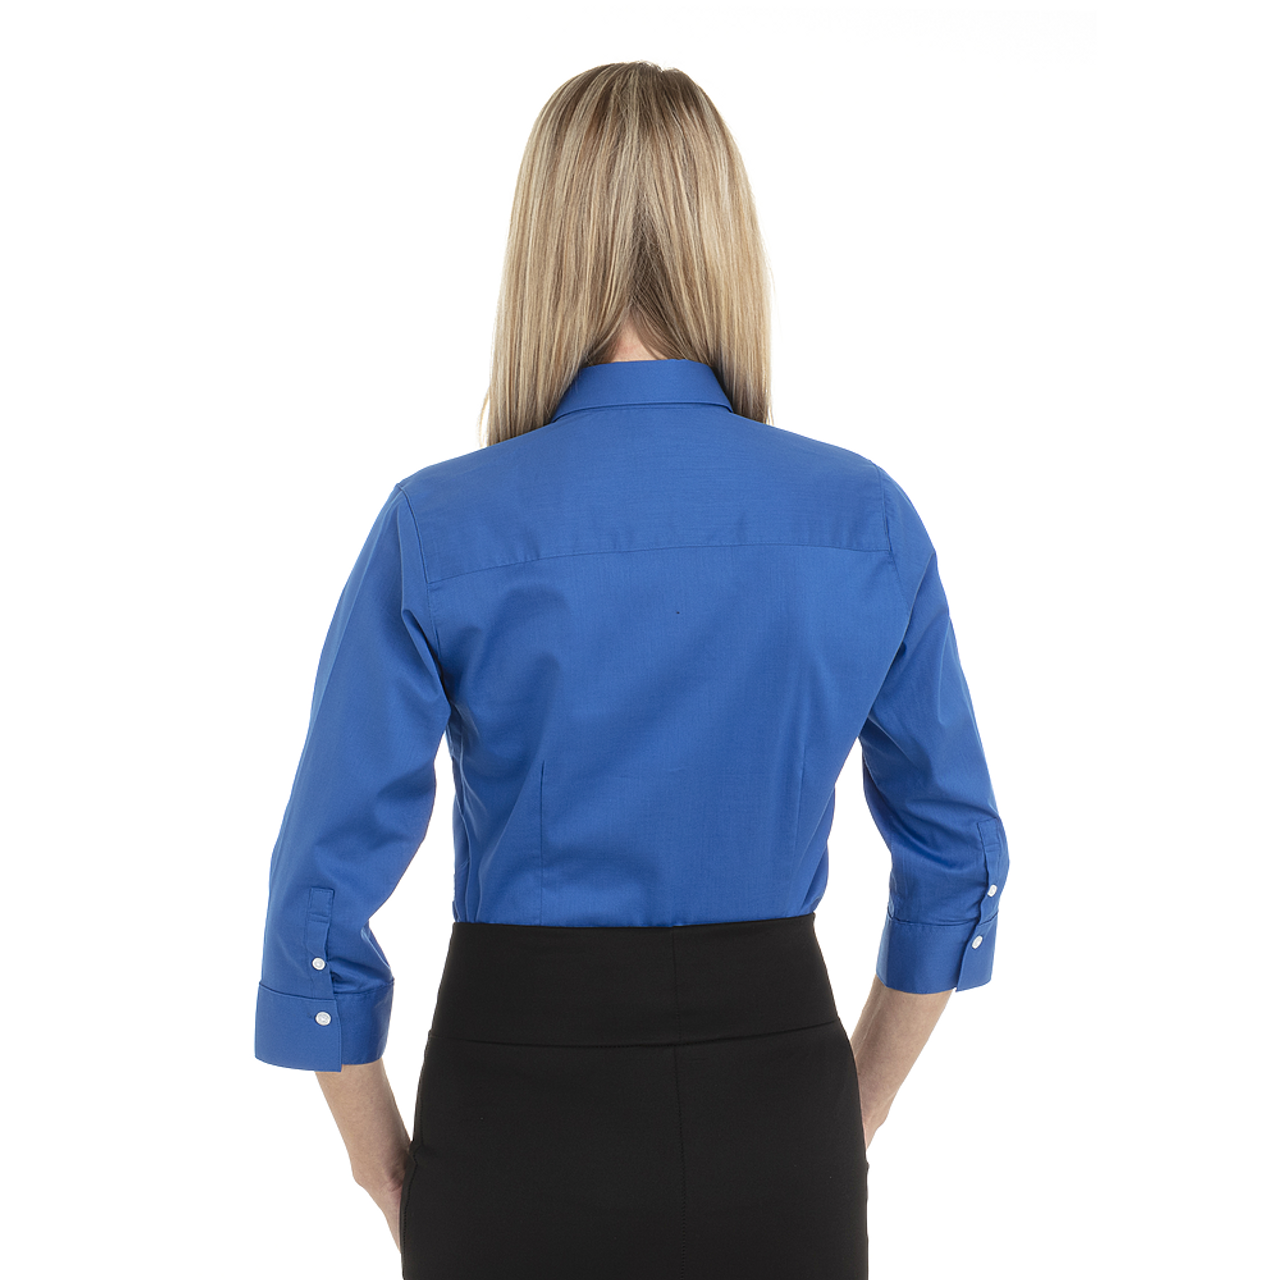 Ultra Blue - Back, 18CV304 Van Heusen Ladies' ¾ Sleeve Dress Twill Shirt | T-shirt.ca